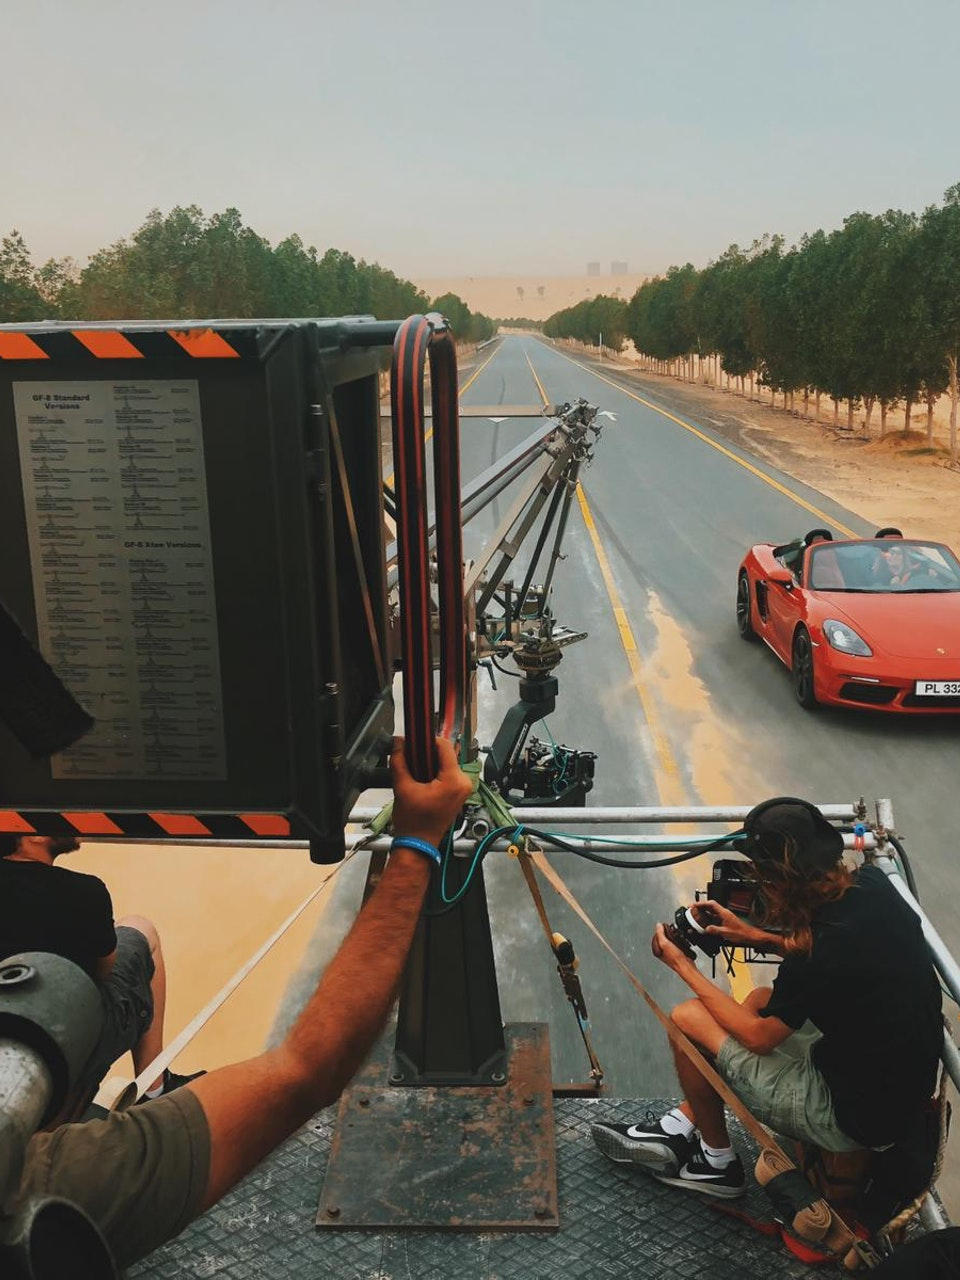 electriclimefilms - Porsche 'Home'